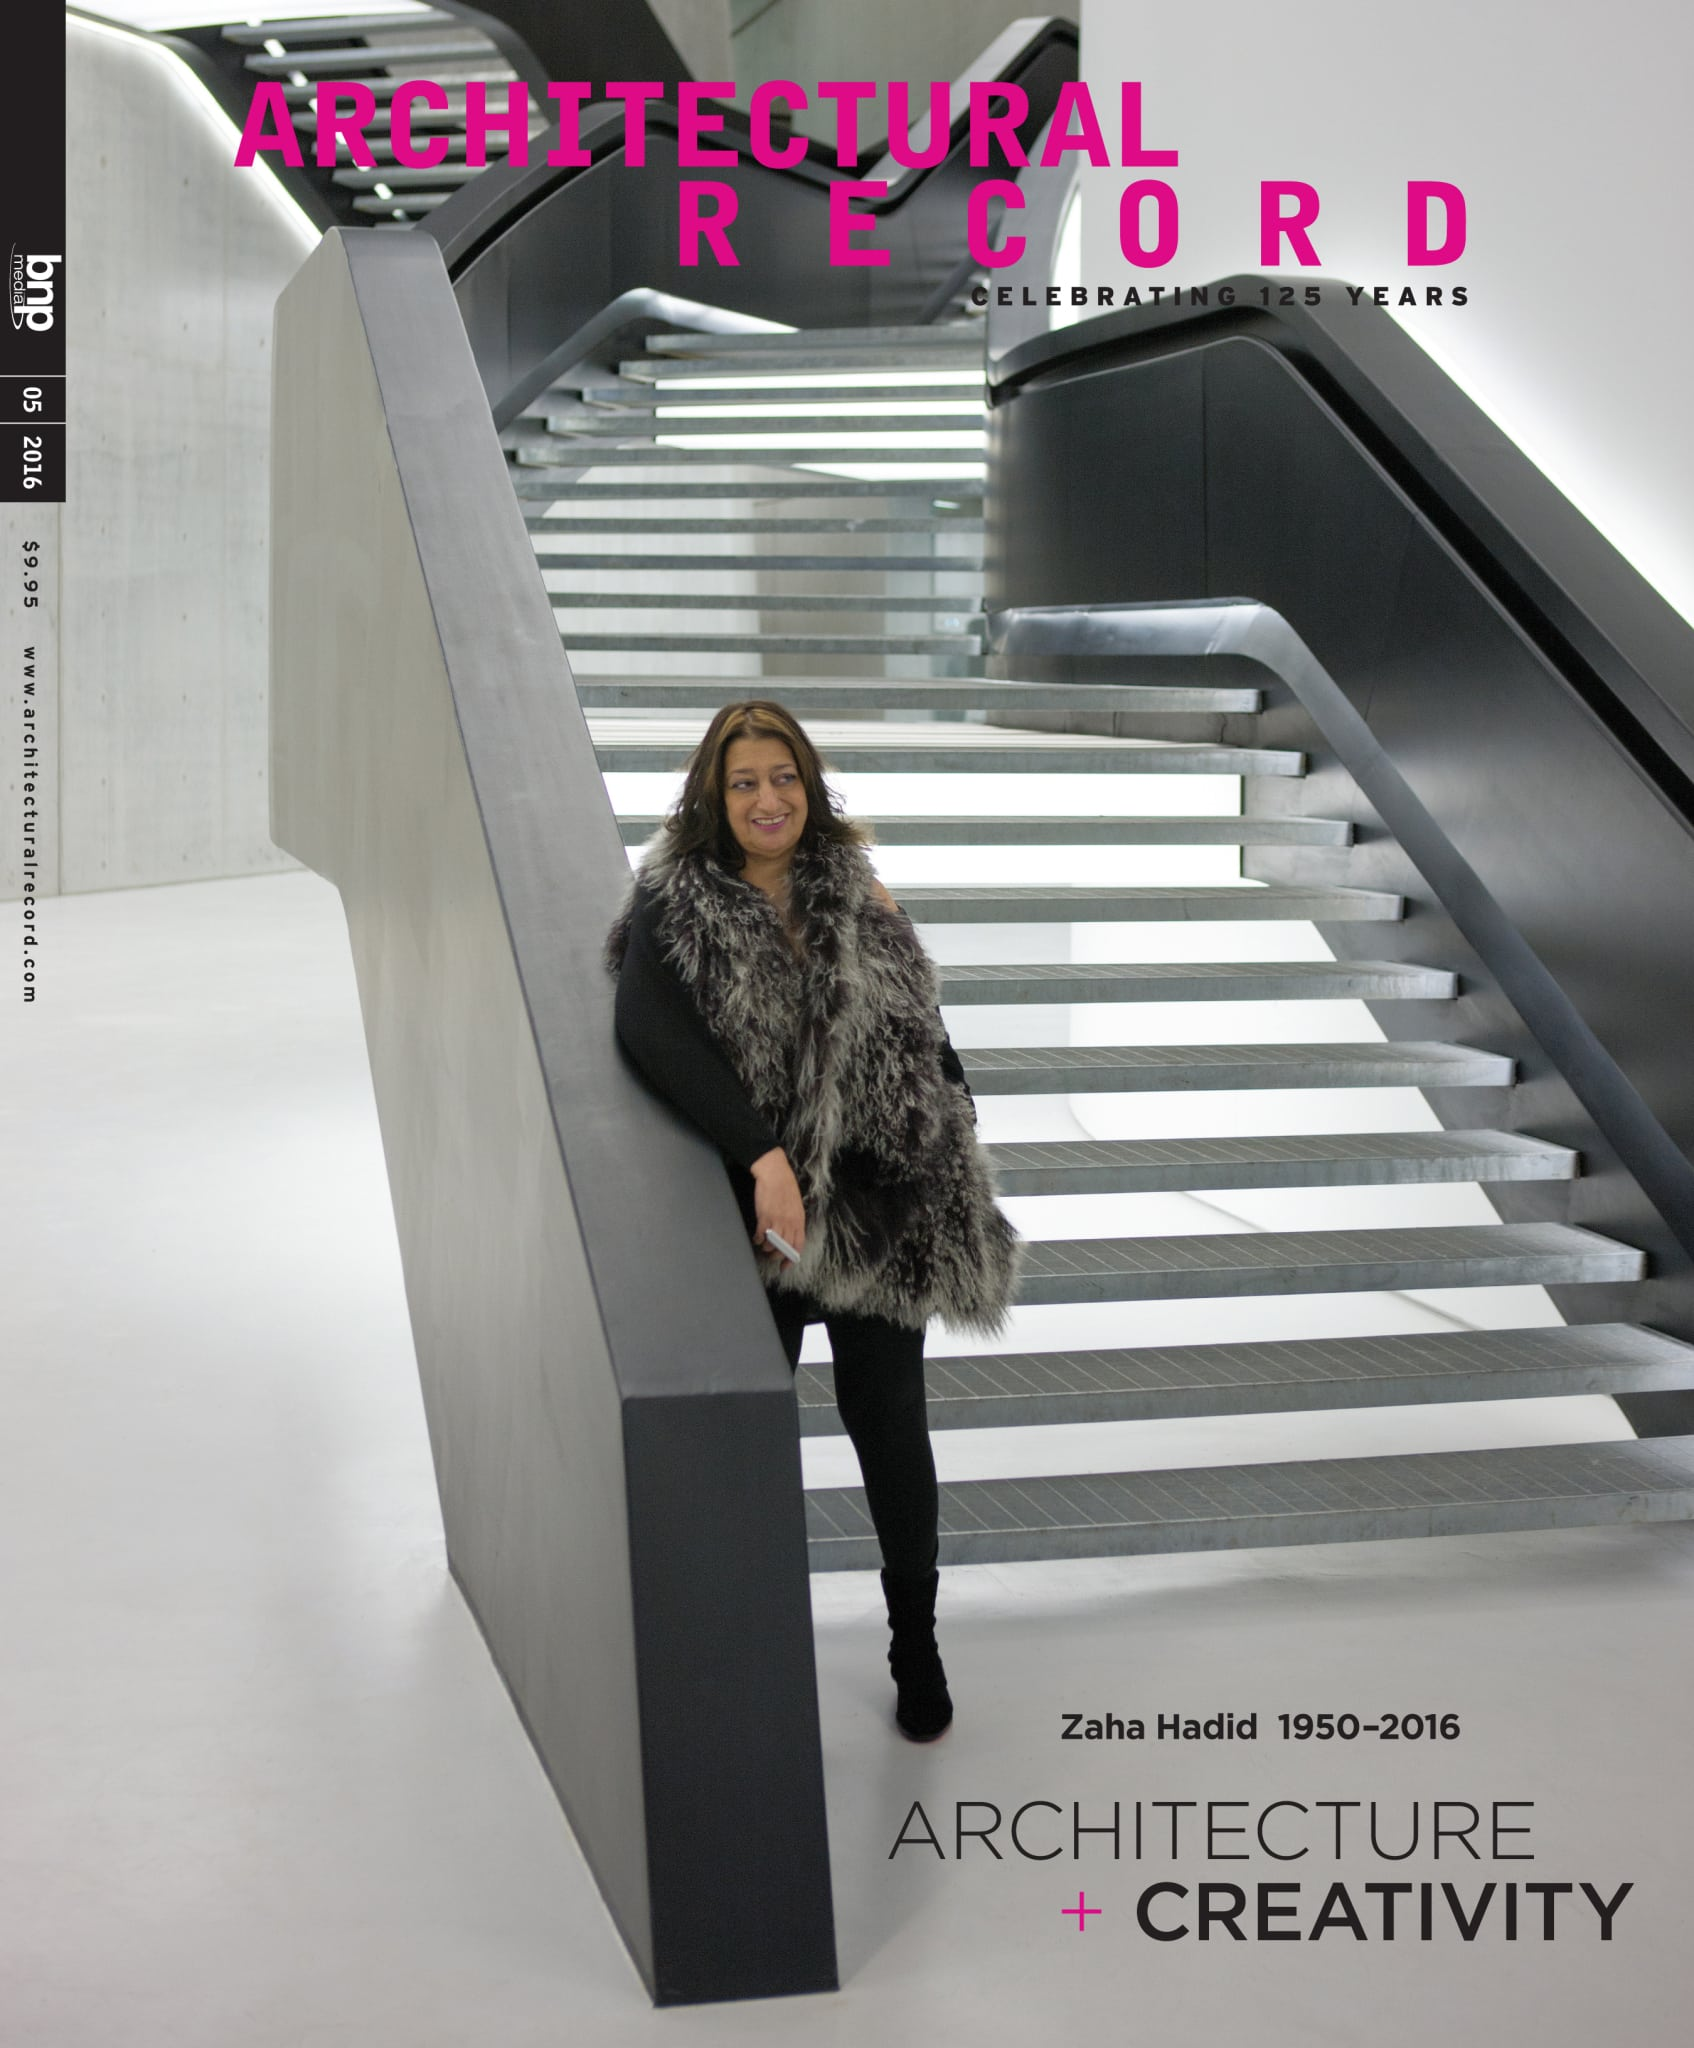 ARCHITECtURAL_RECORD_B2B_Full_Issue_Eddies